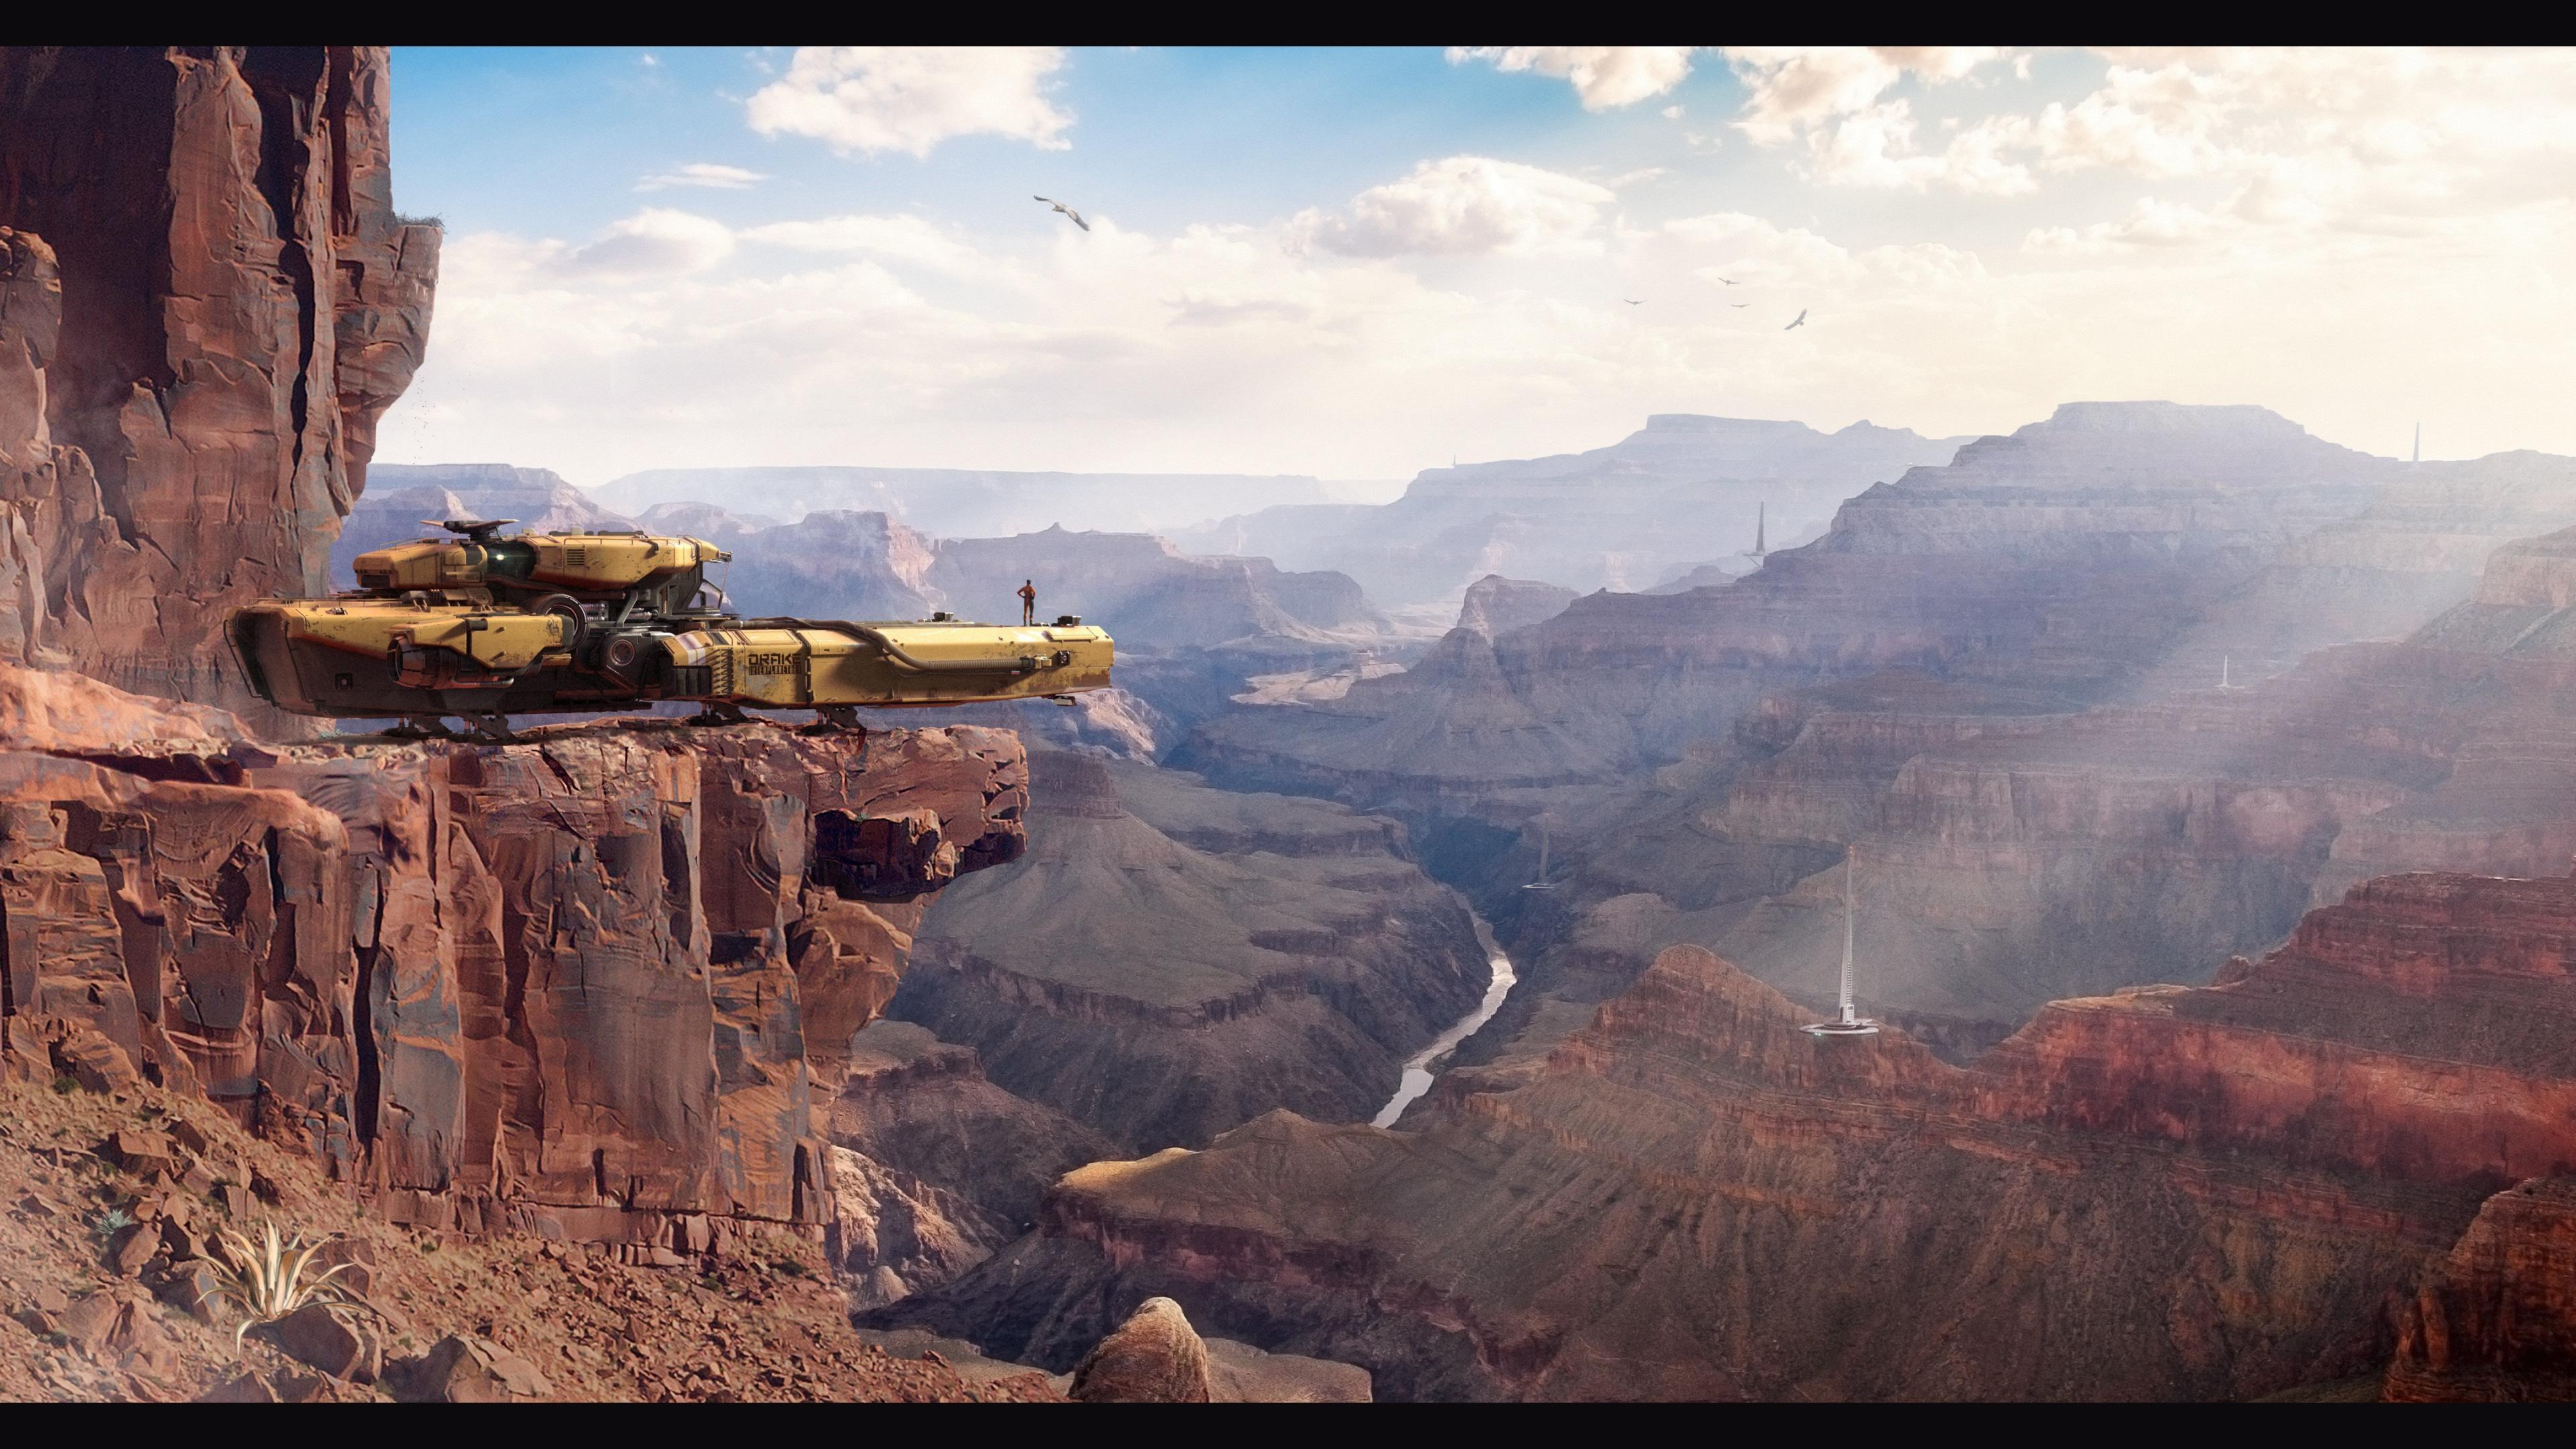 DRAKE Vulture z widokiem na kanion